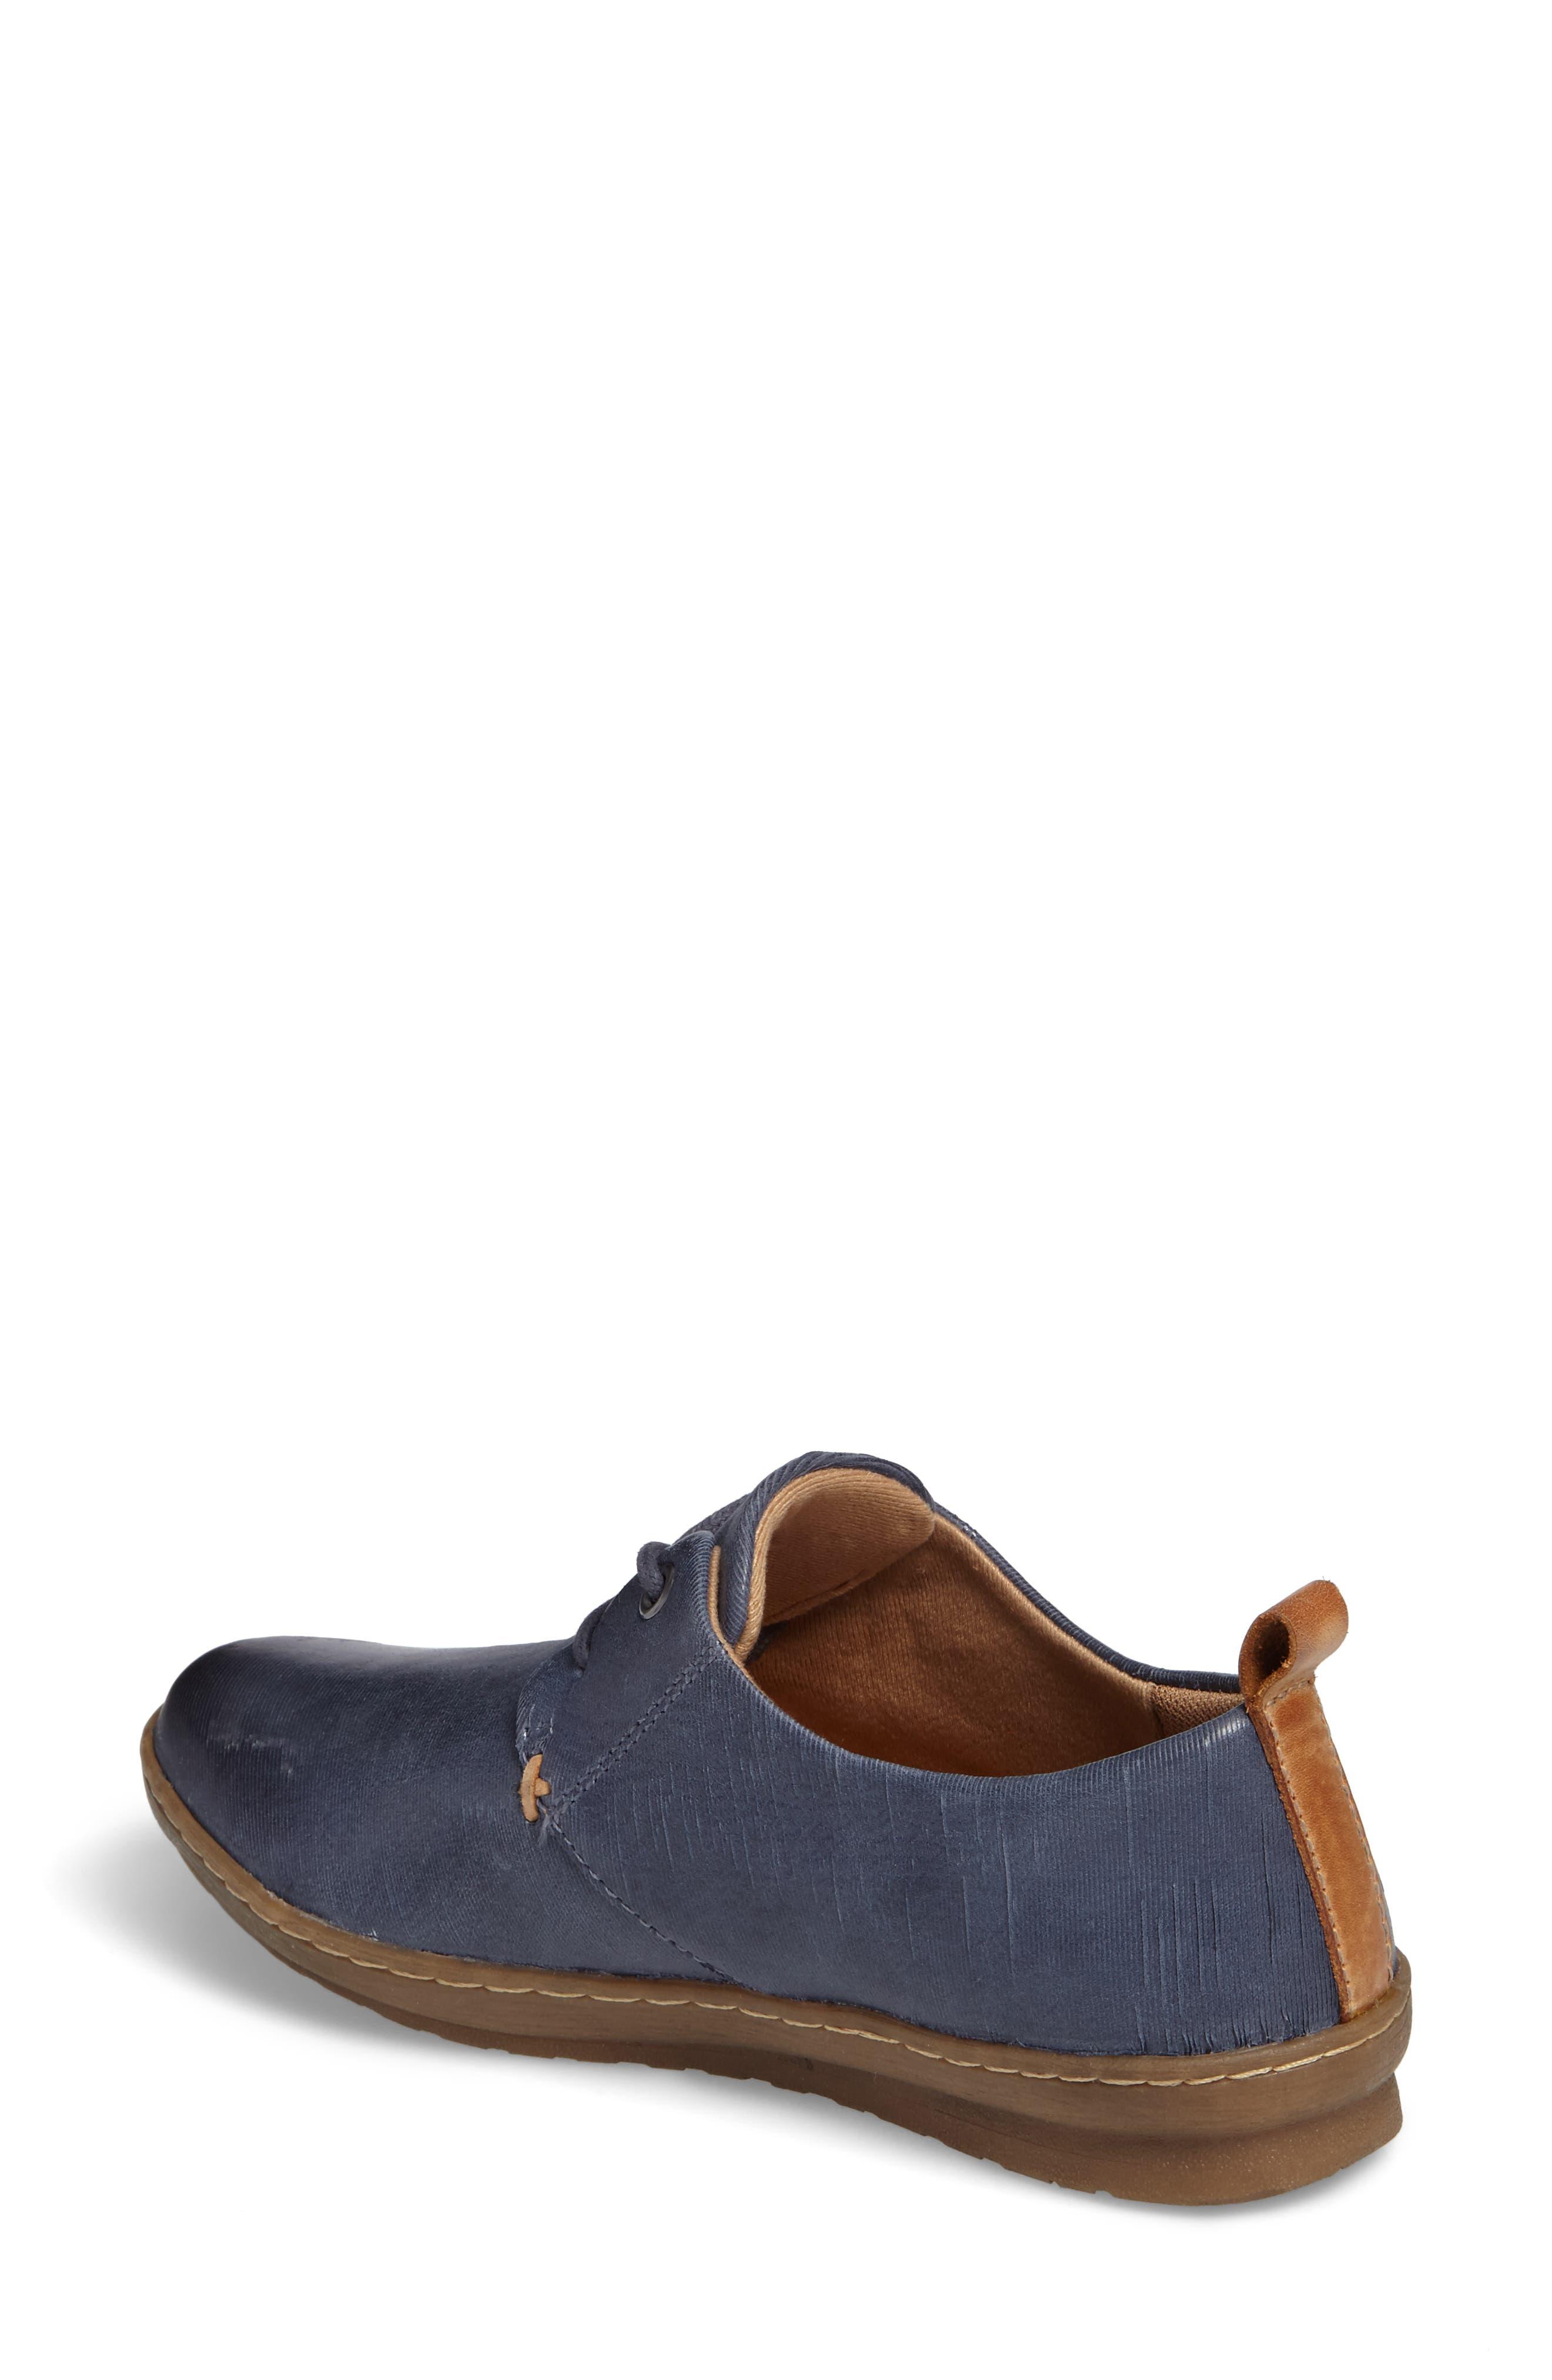 Cassandra Siped Sneaker,                             Alternate thumbnail 2, color,                             Denim Blue Leather